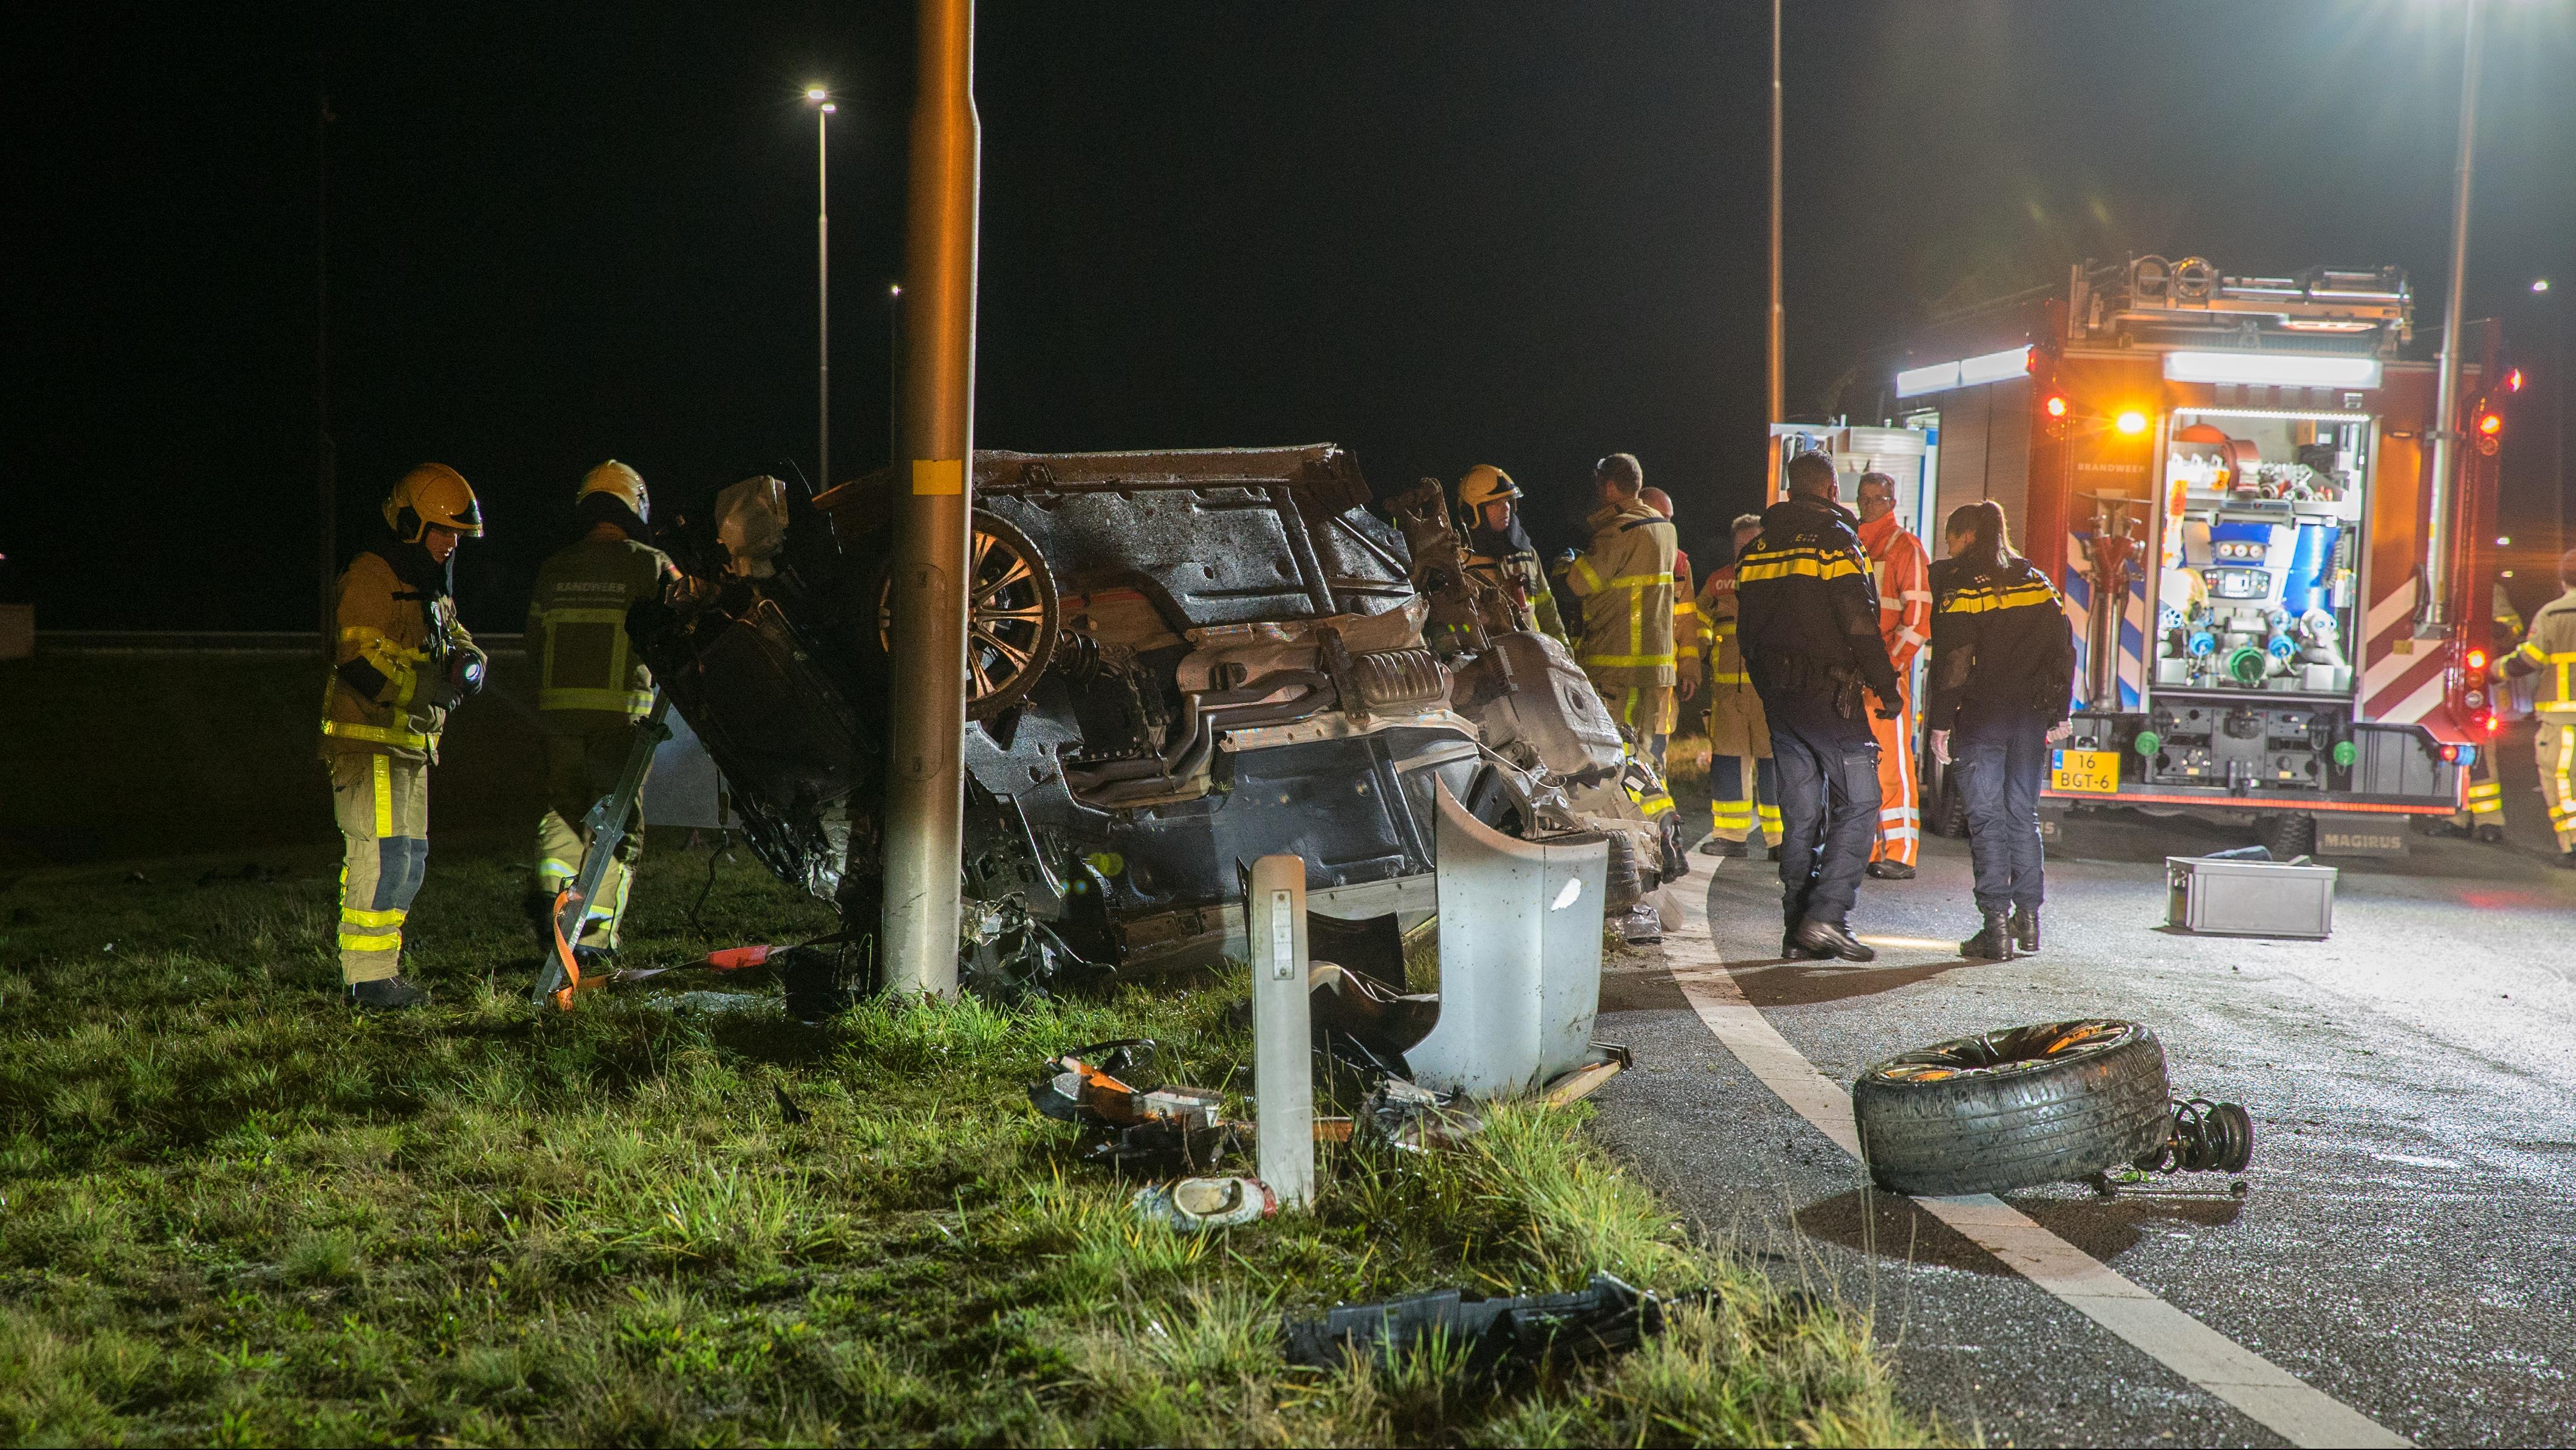 Deventenaar en Zwolse gewond bij ernstig ongeluk op verbindingsweg A1 en A50.